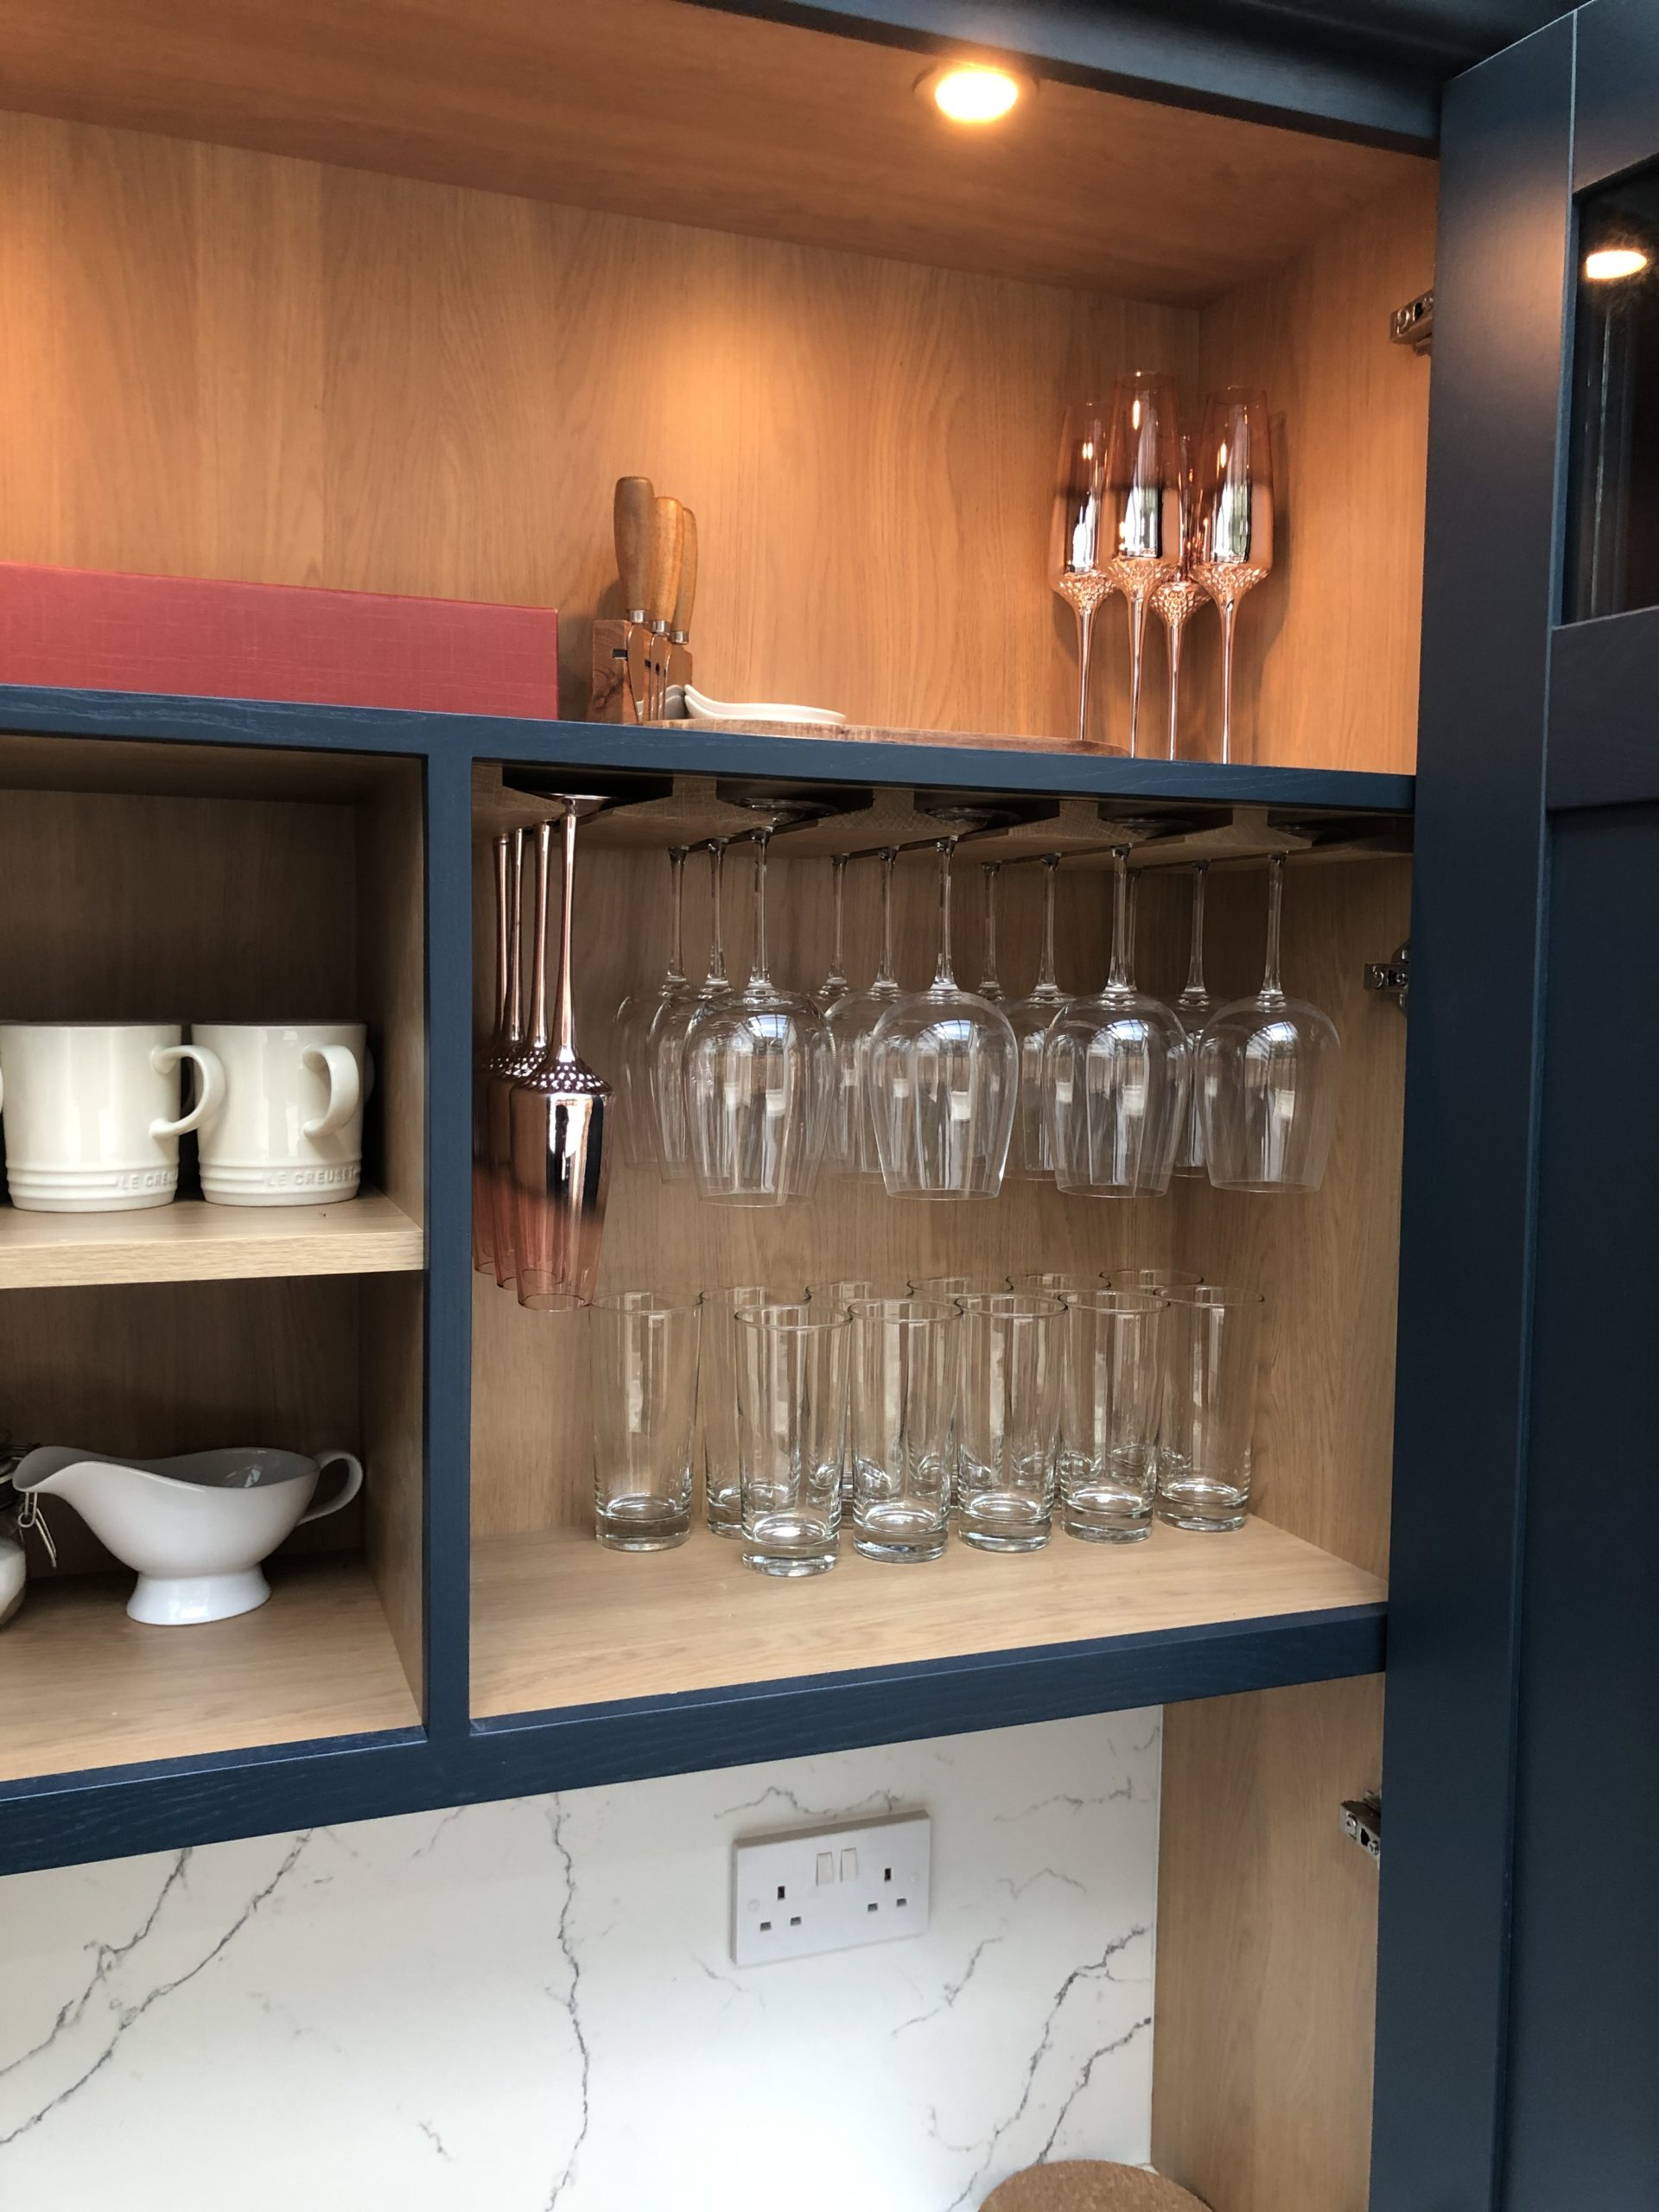 Woodbine-Kitchen-Cabinet-Glasses